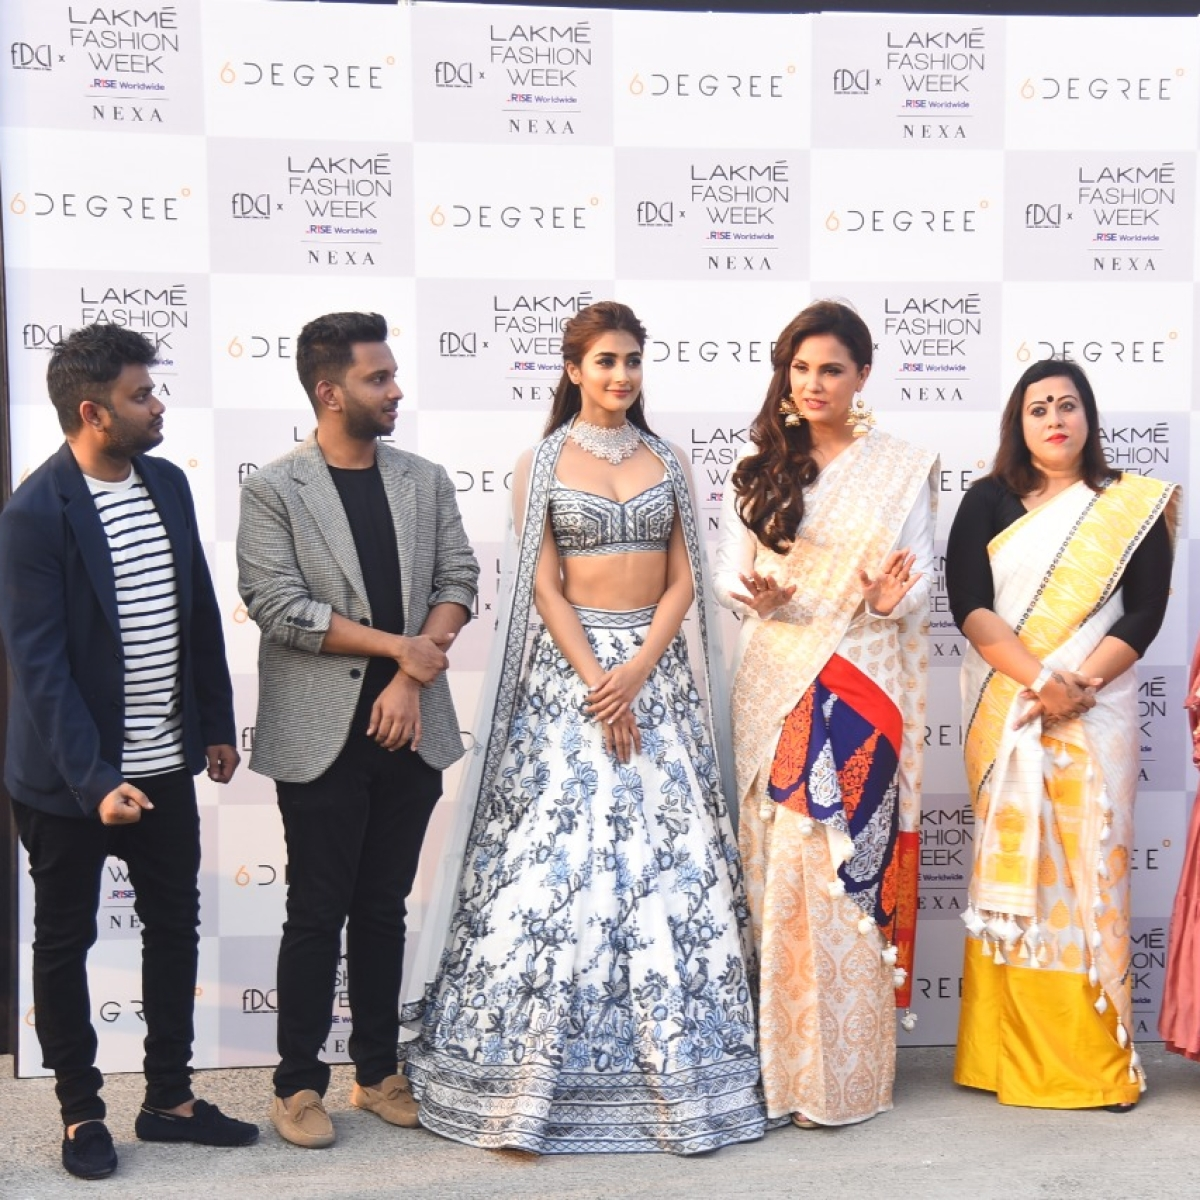 In Pics: Pooja Hegde, Lara Dutta Bhupathi, Hina Khan grace the ramp at FDCI X Lakme Fashion Week 2021